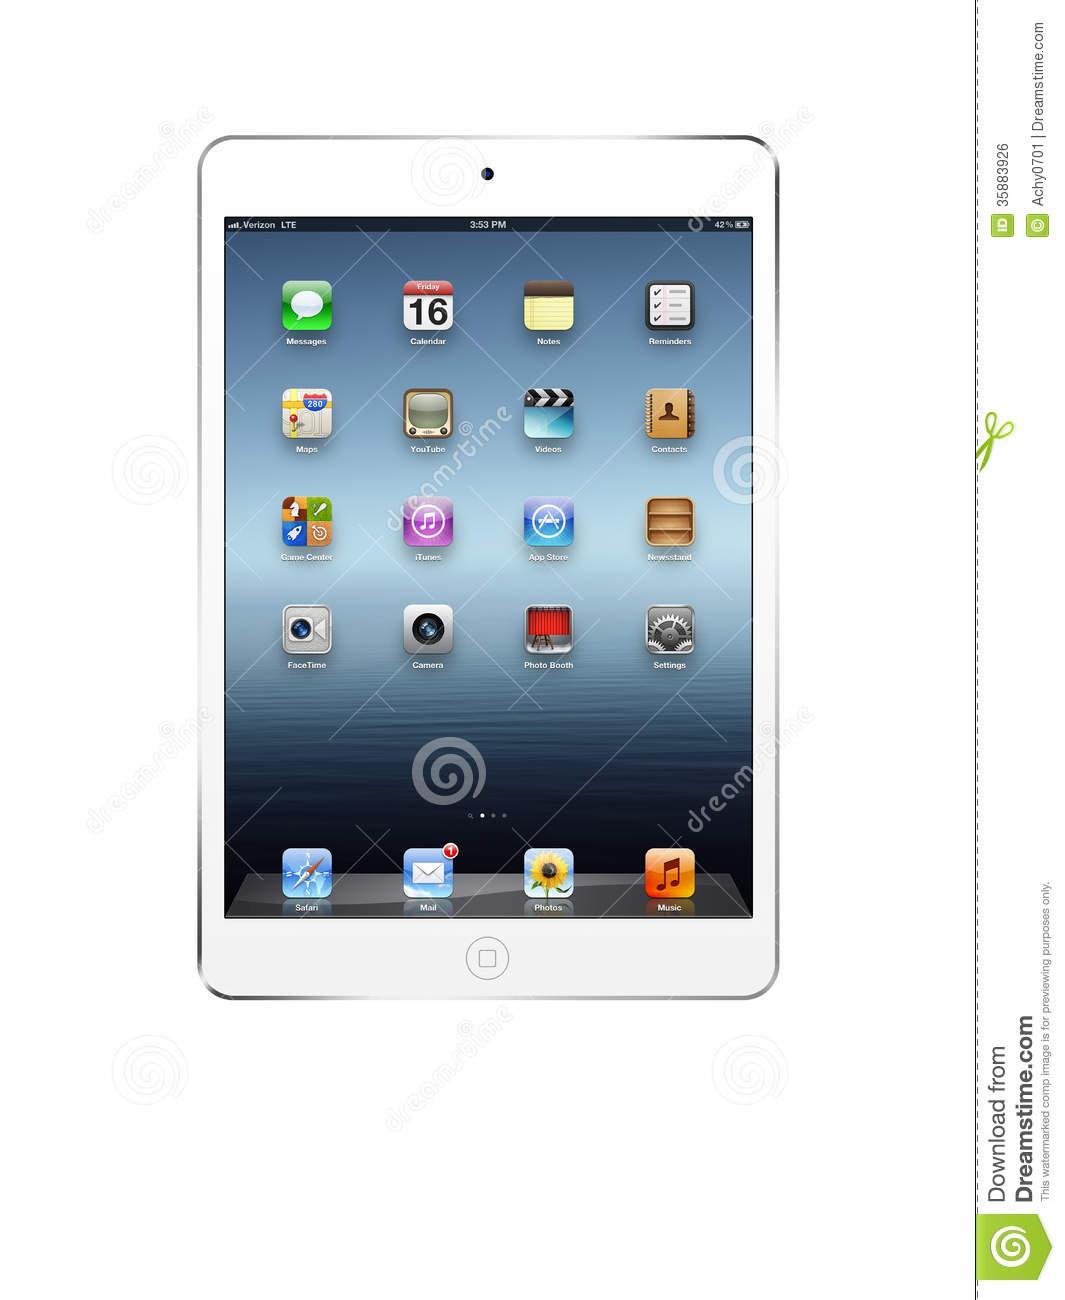 Refurbished iPad mini 2, wi-Fi 16GB - Silver, apple IPad mini 2 with, retina display - Technical., apple IPad - Compare Models, apple